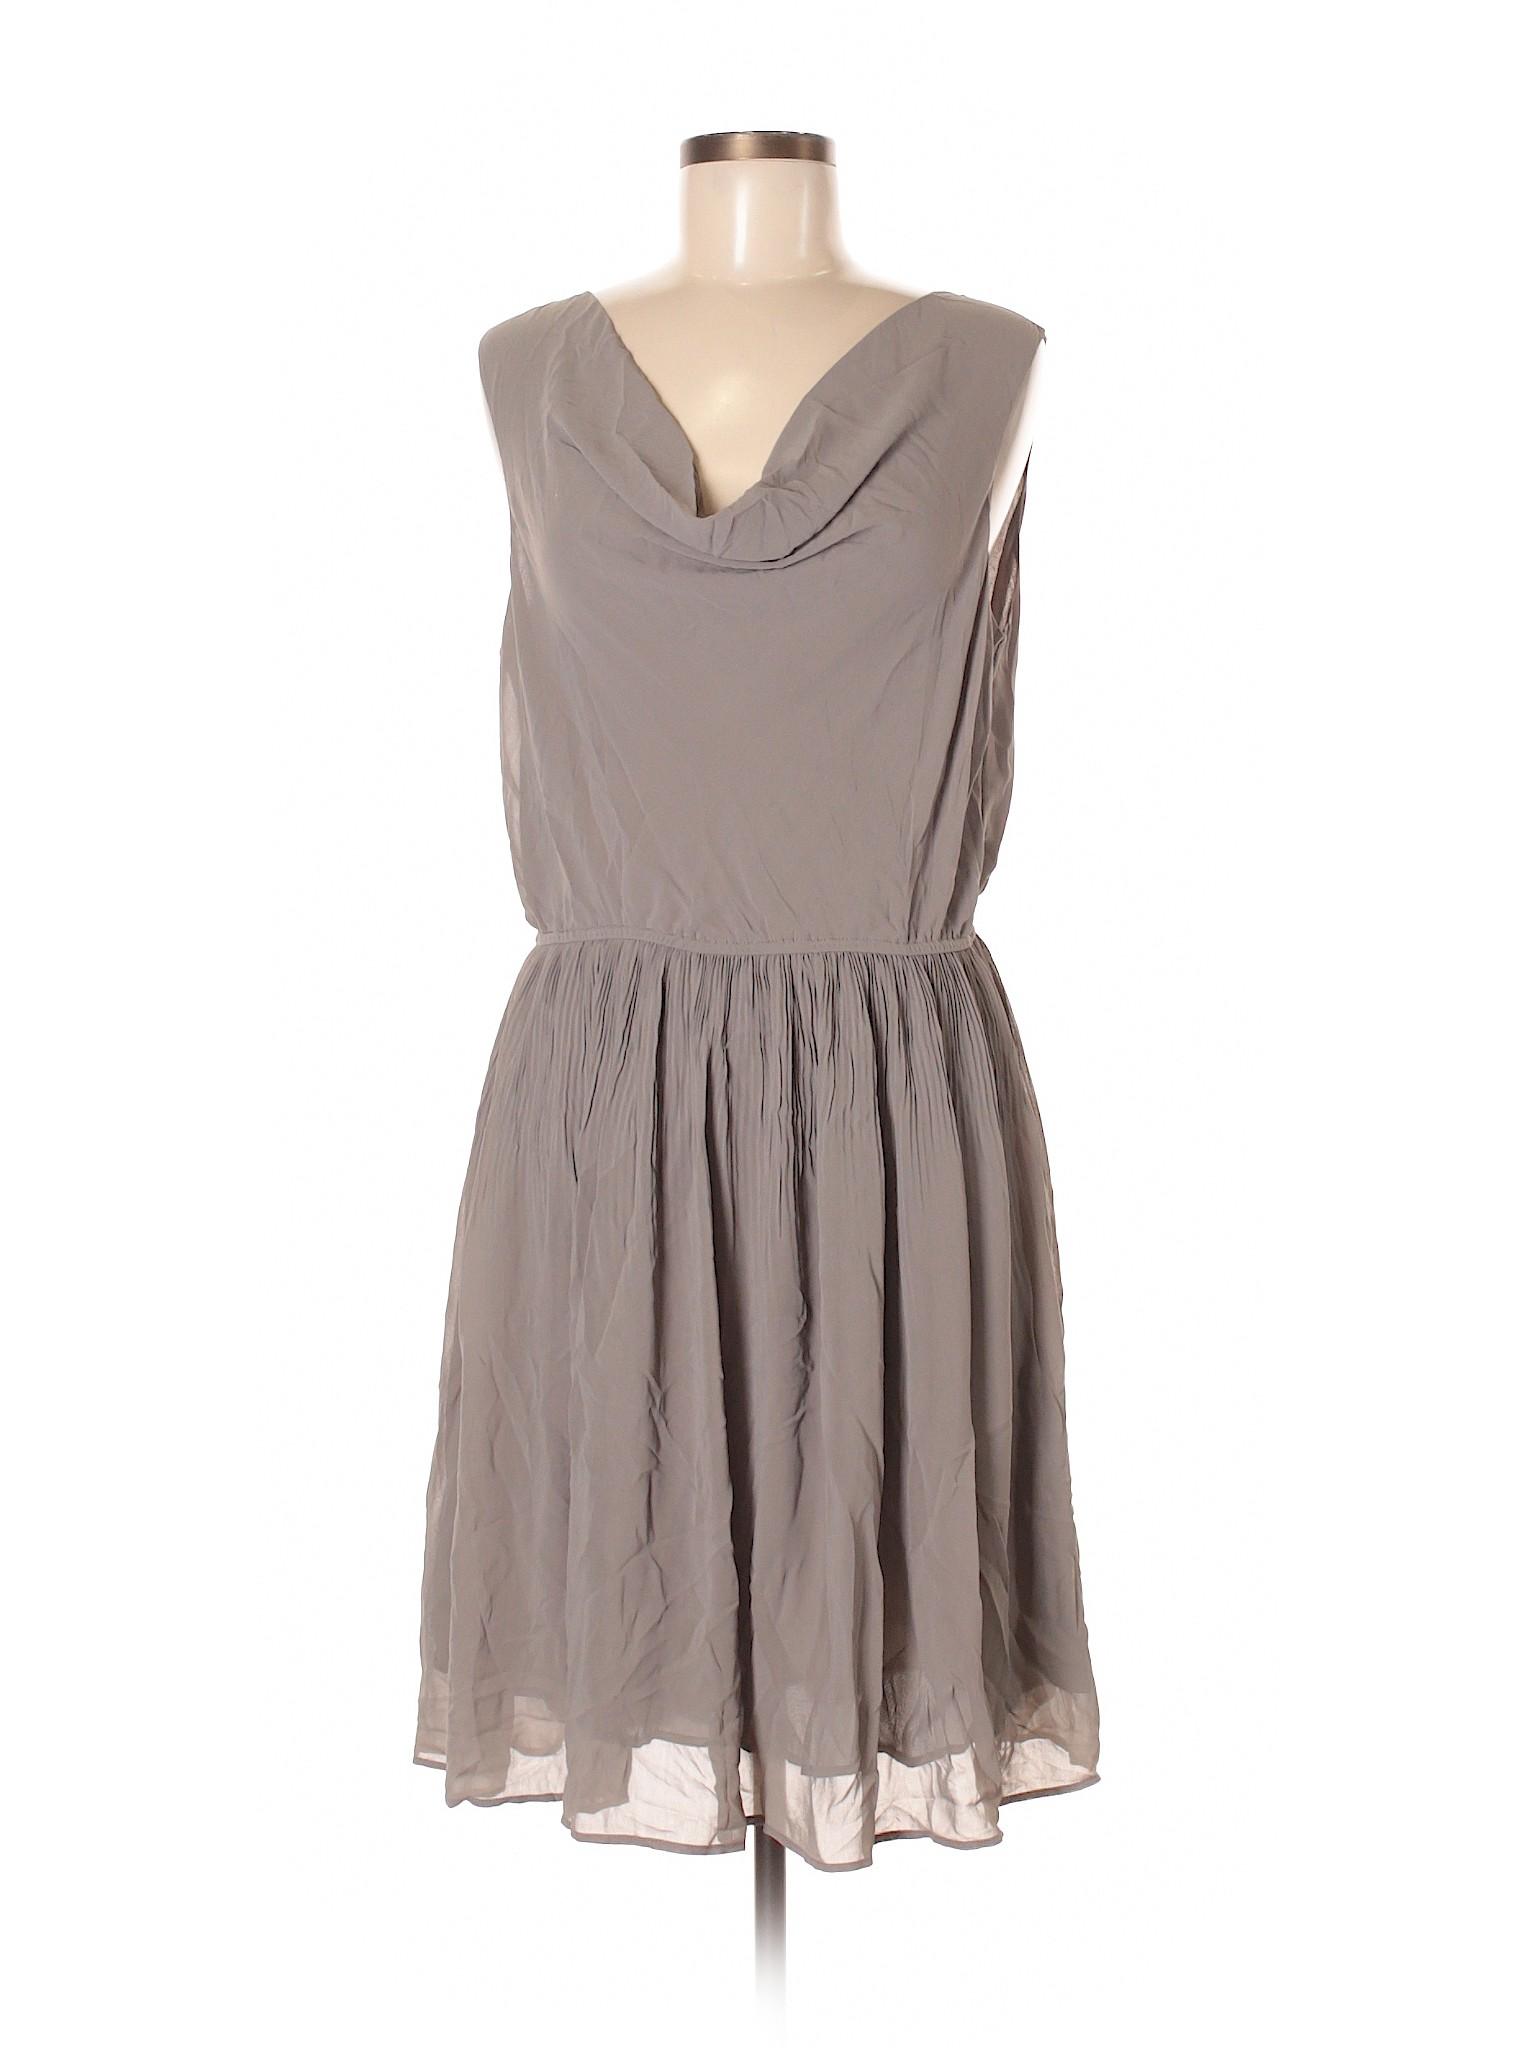 amp;M Boutique Casual H winter Dress EUq0YUw